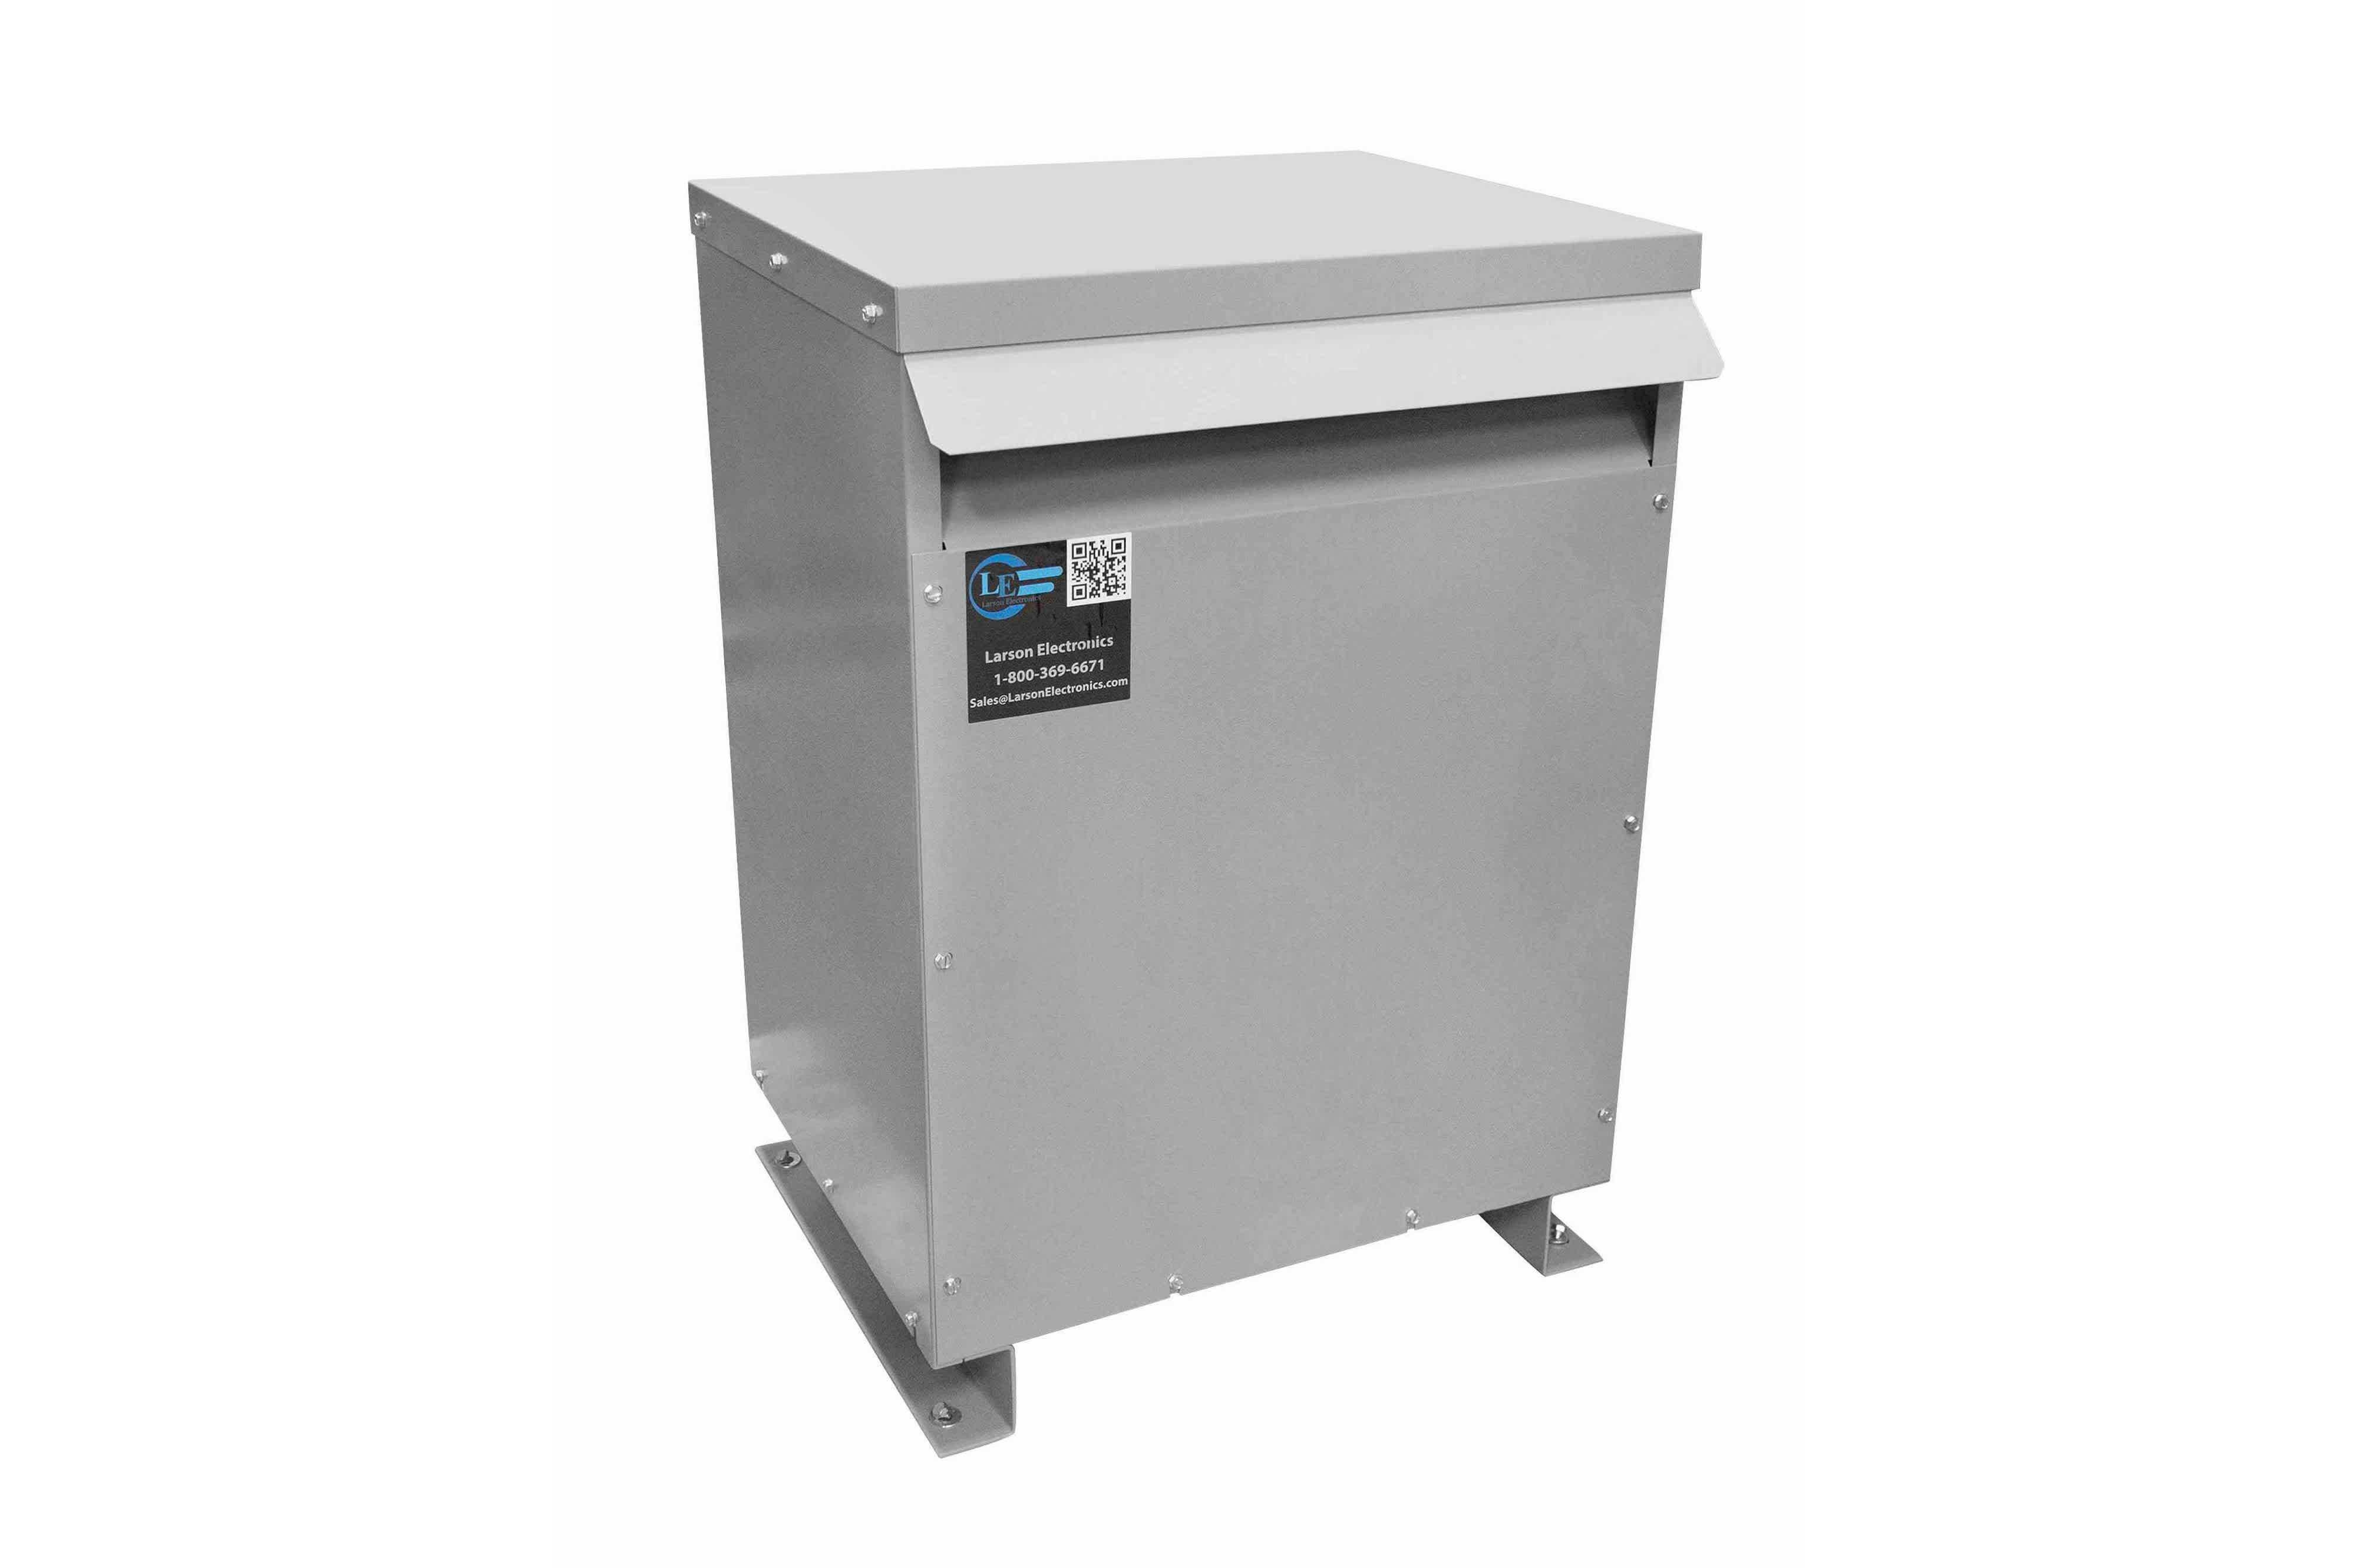 500 kVA 3PH DOE Transformer, 460V Delta Primary, 575Y/332 Wye-N Secondary, N3R, Ventilated, 60 Hz